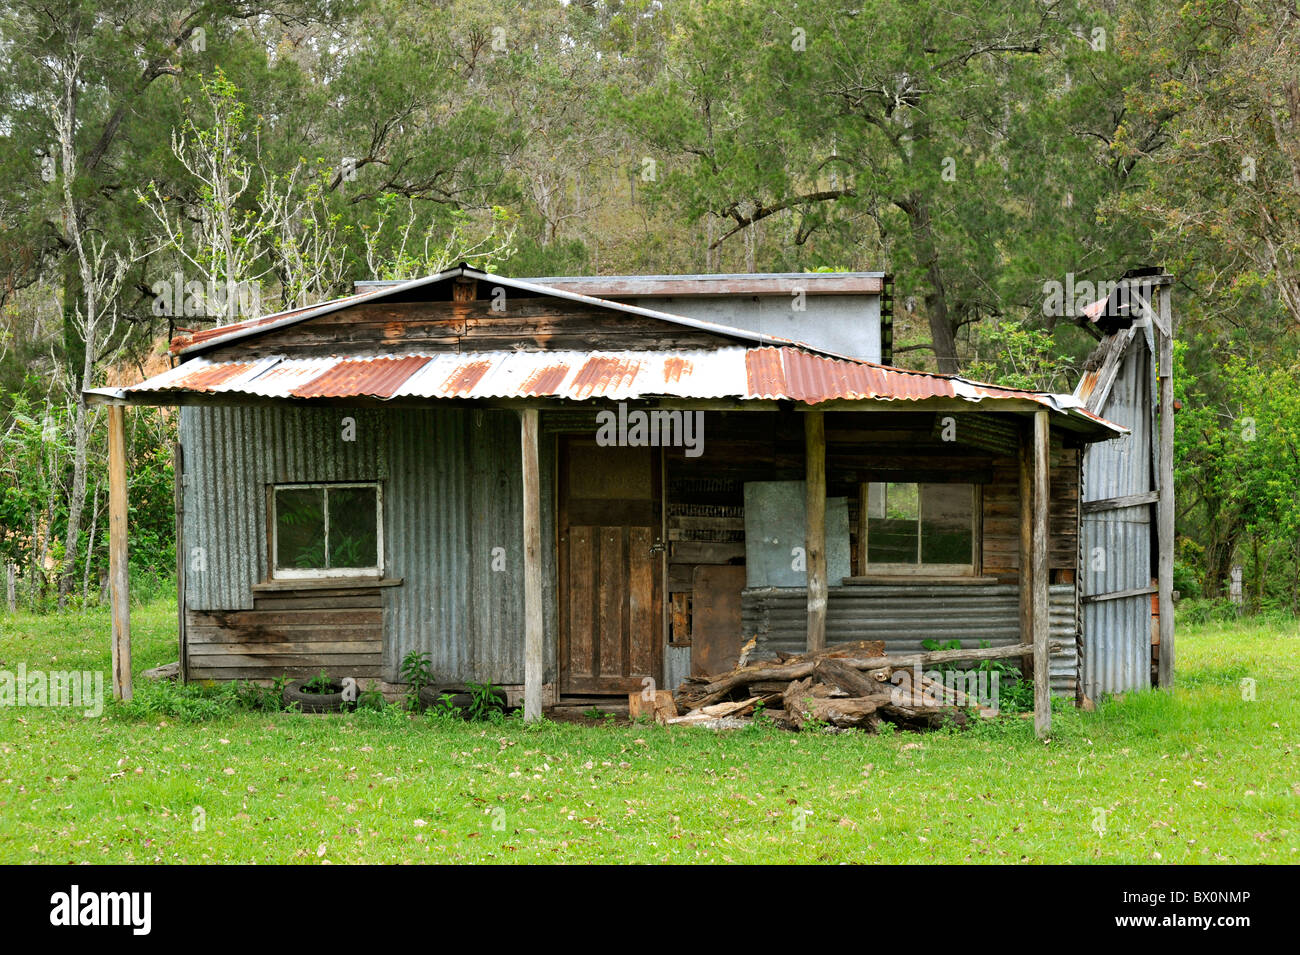 Corrugated Iron Bush hut in Australia - Stock Image